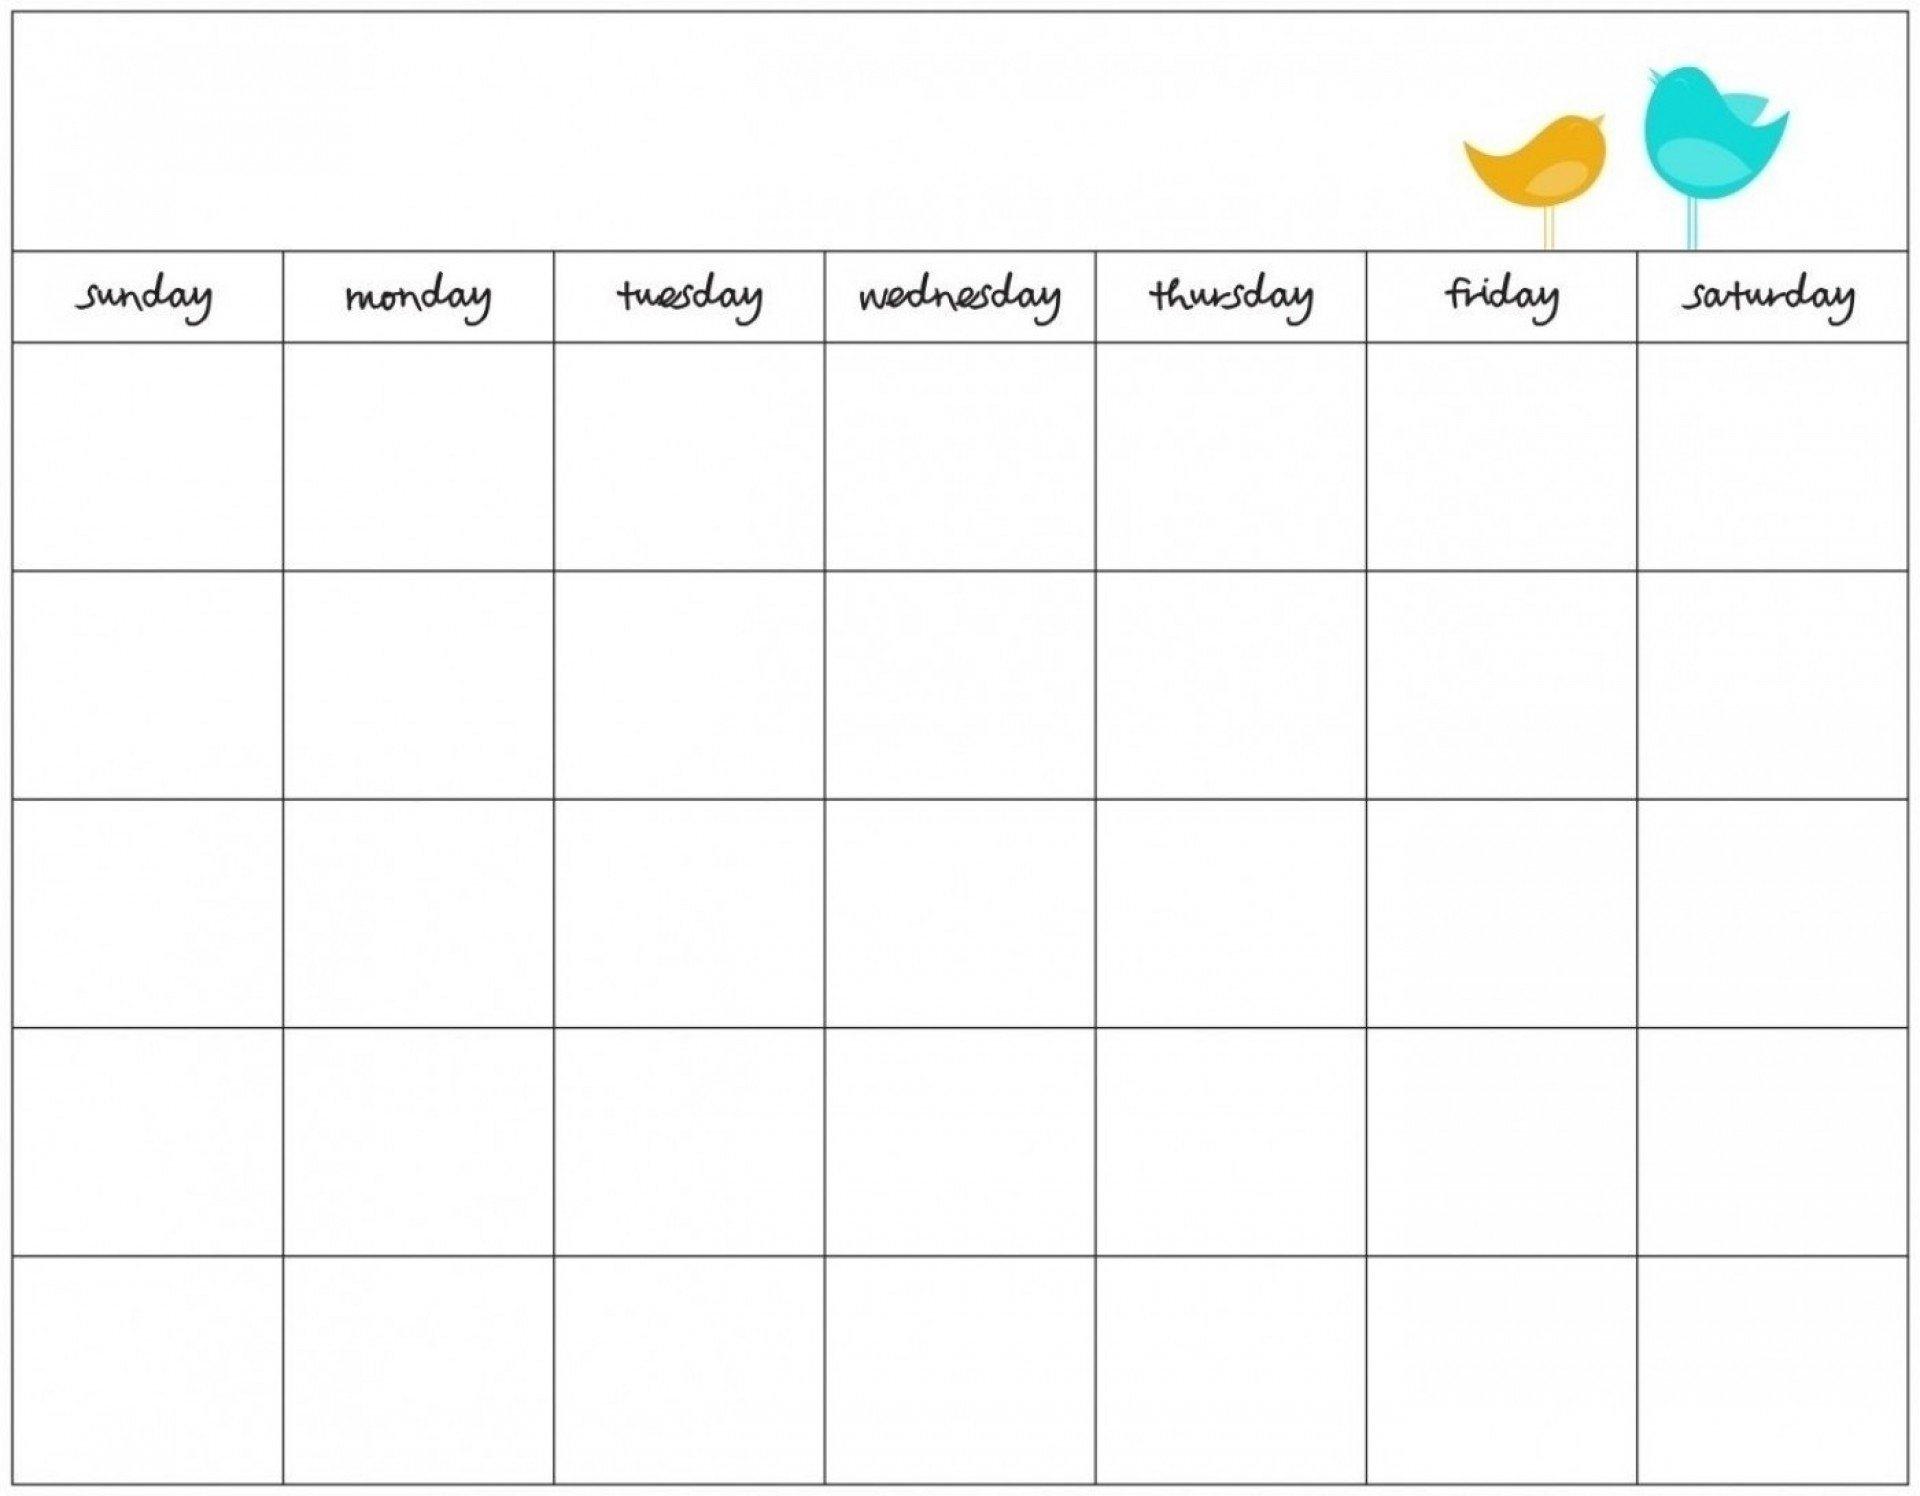 Blank 7 Day Calendar To Print | Free Calendar Template Example Blank 7 Day Calendar Template